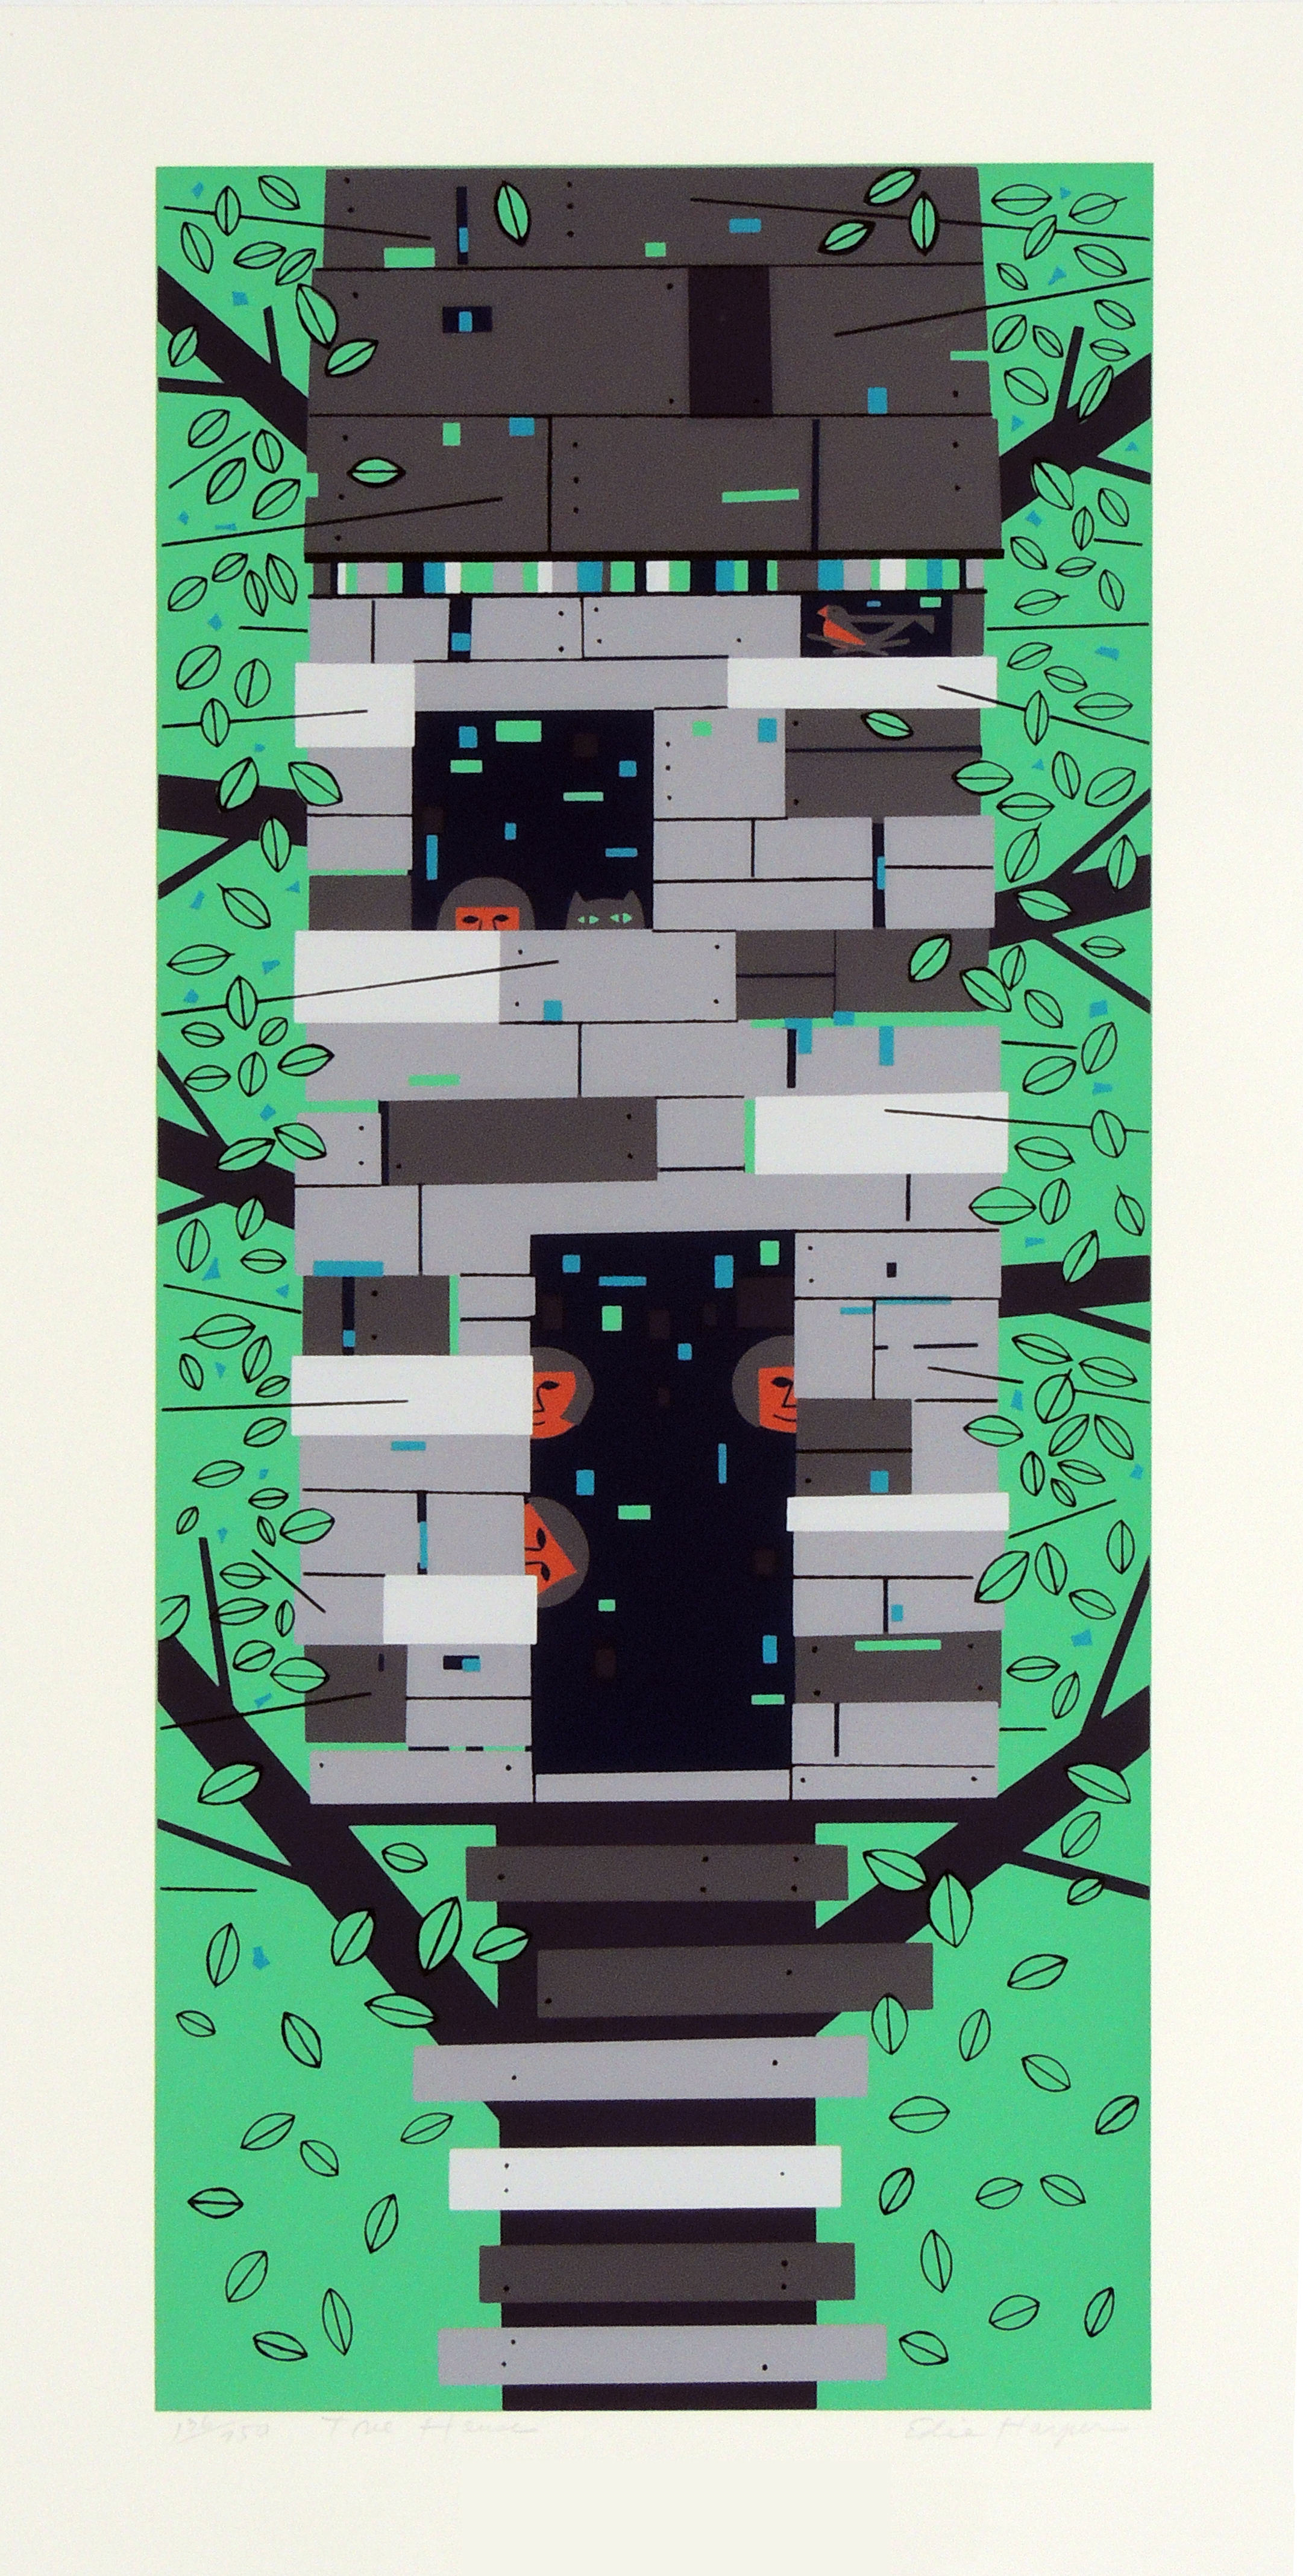 Edie Harper | TREE HOUSE | serigraph on paper | 24 x 10-7/8